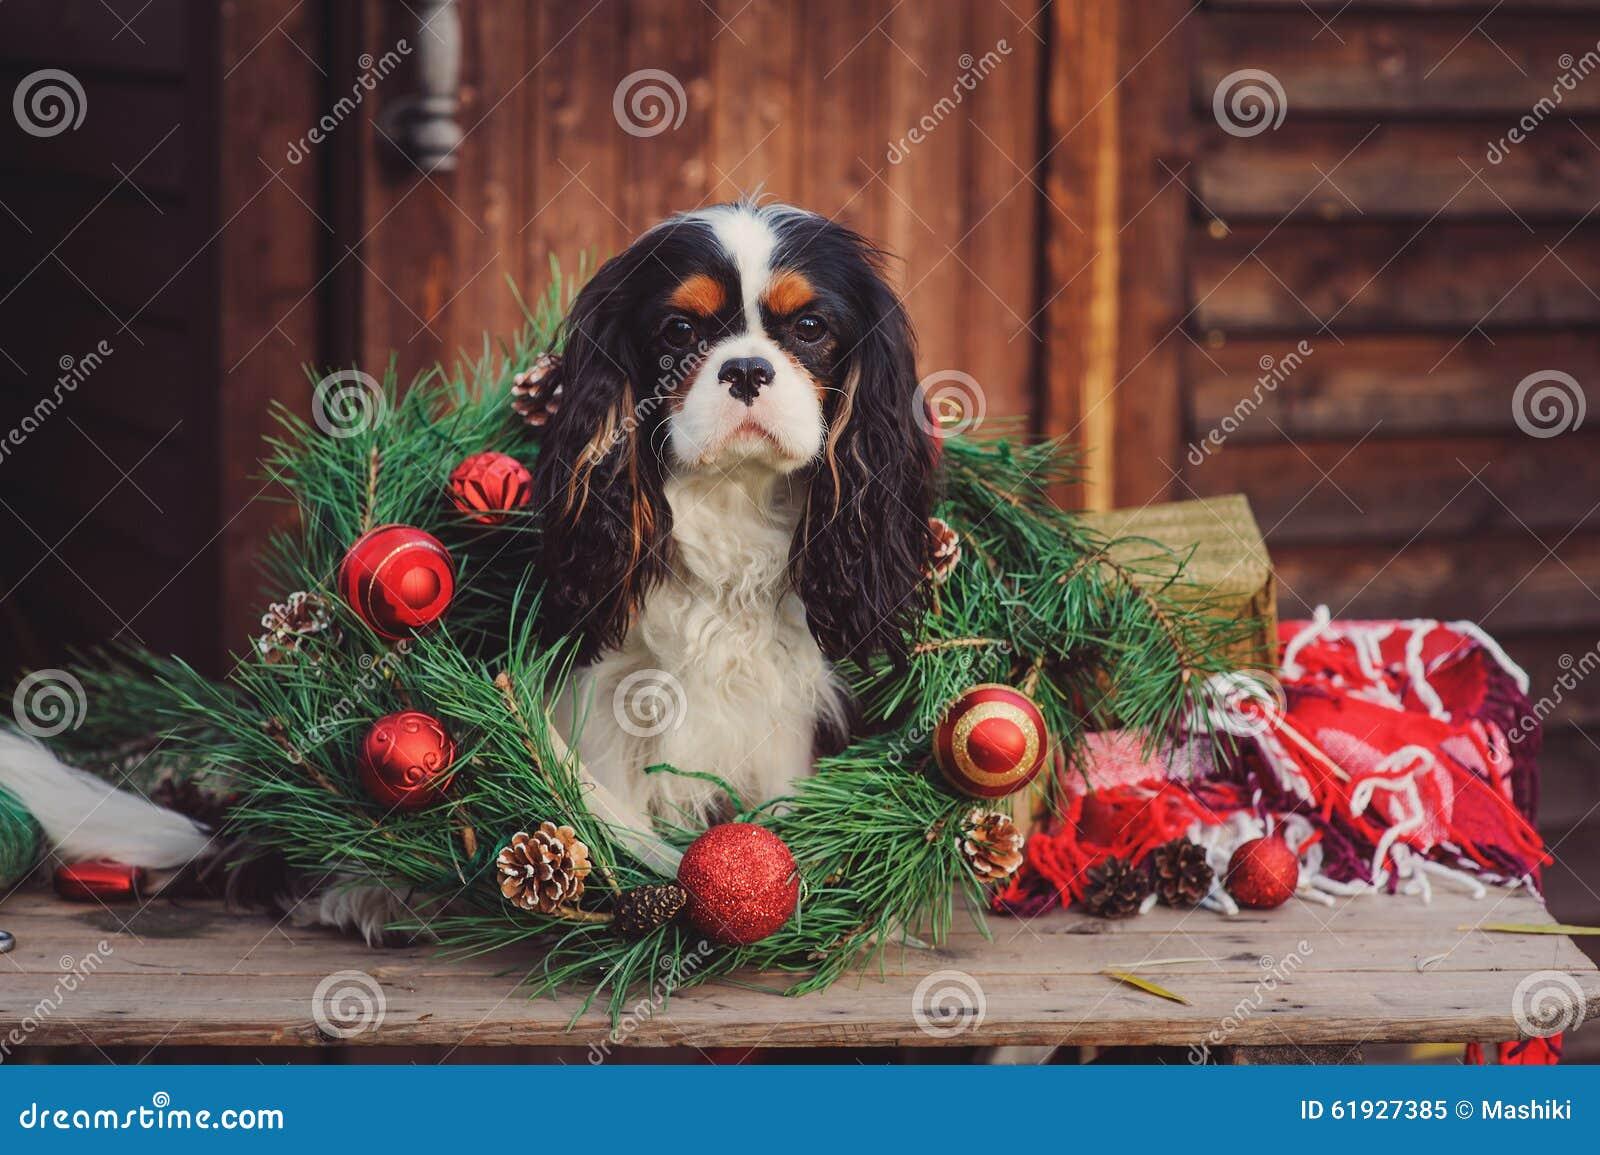 Black Fluffy Dog Christmas Cards